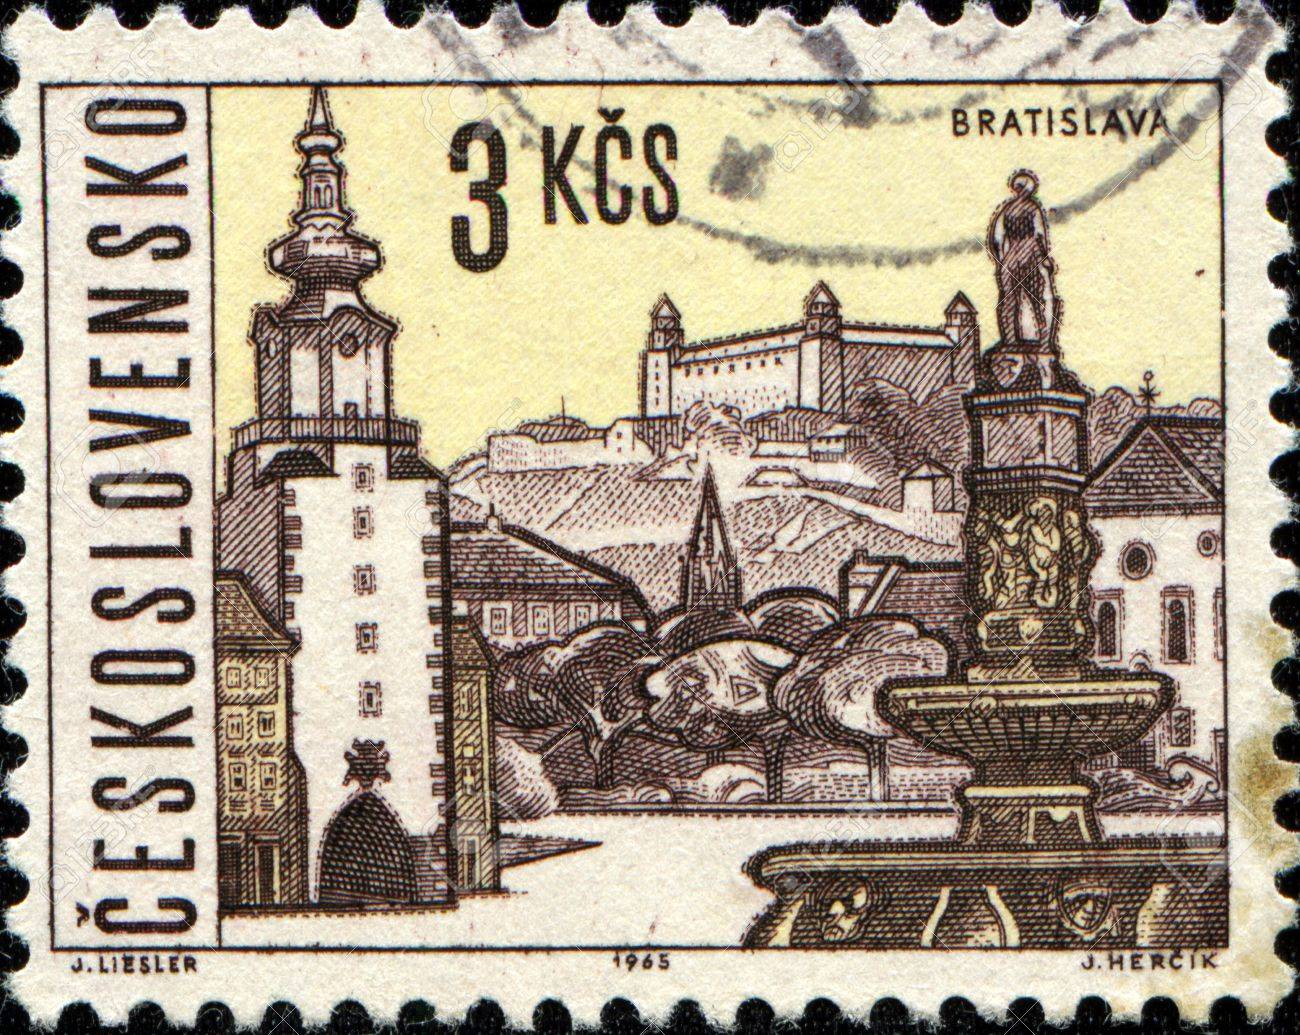 CZECHOSLOVAKIA - CIRCA 1965  A stamp printed in Czechoslovakia shows  Bratislava, the capital of Slovakia, circa 1965 Stock Photo - 14198634